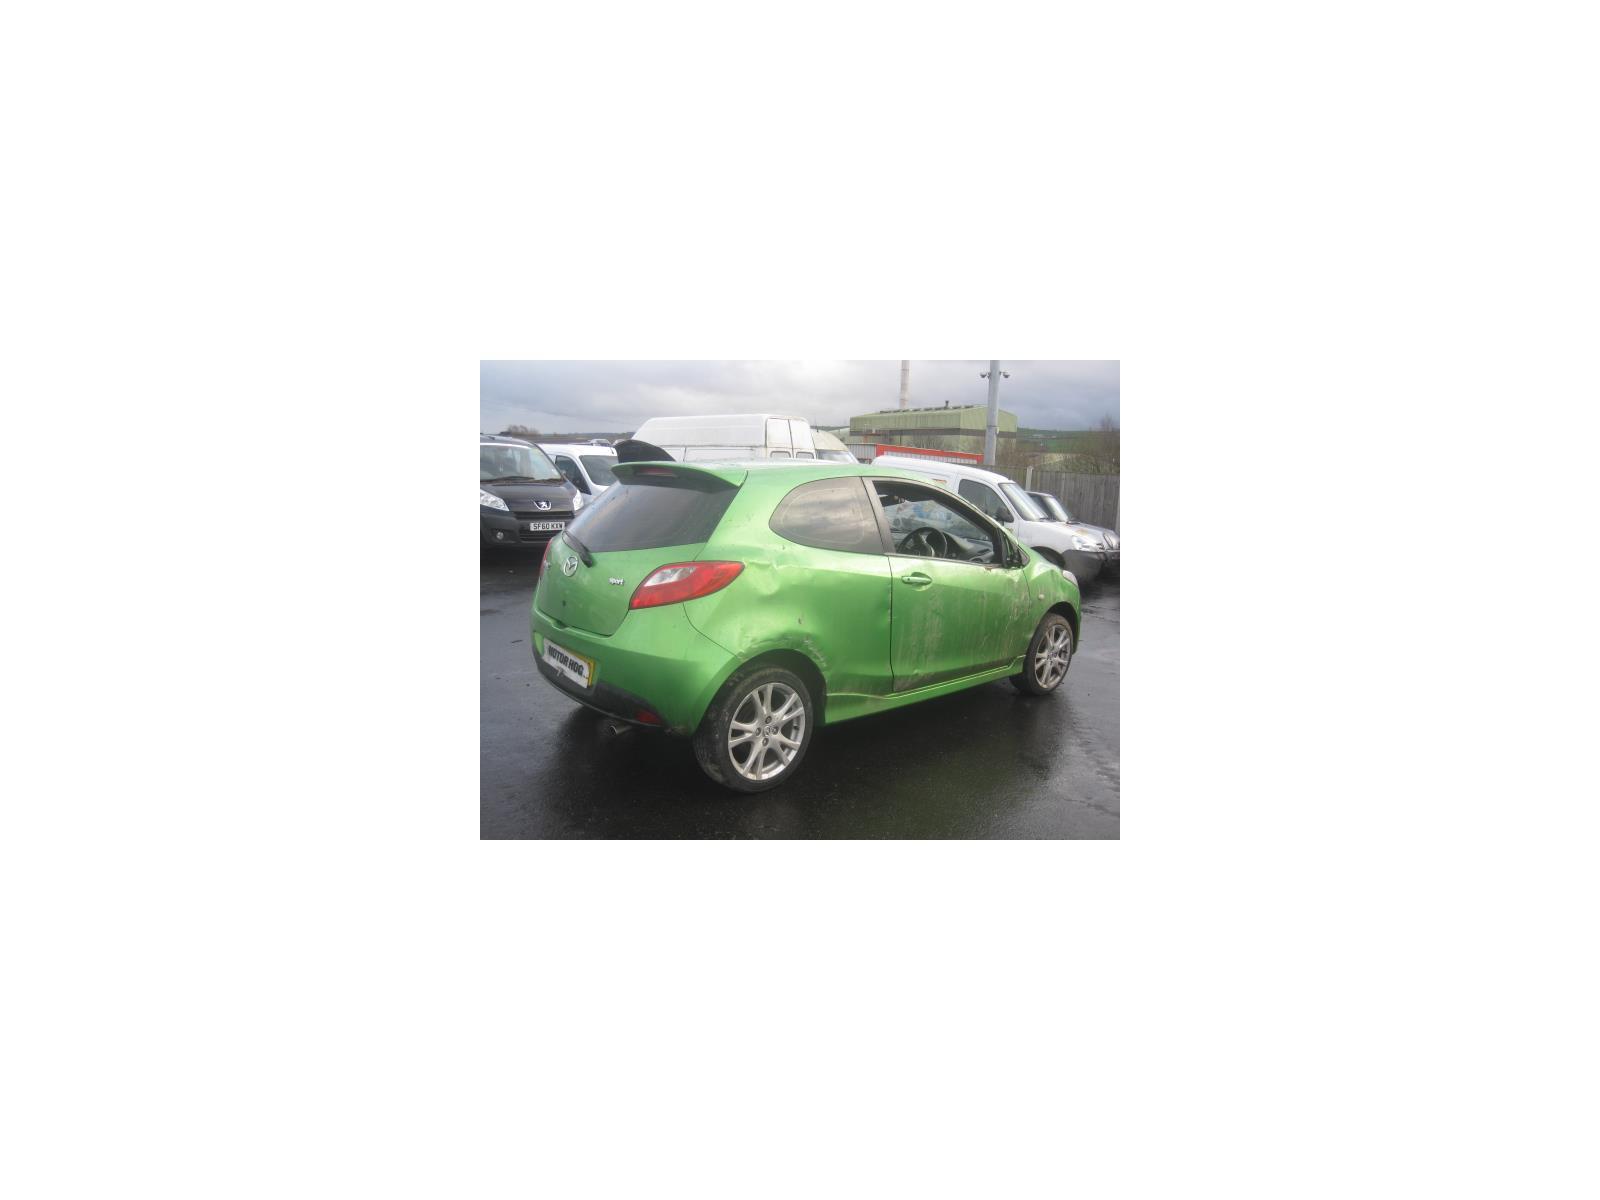 https://s3.eu-west-2.amazonaws.com/doncaster-image-drive/Vehicle/2017/February/fef0063b-b6ff-420c-b7b8-9b138d48f221_6320859.JPG